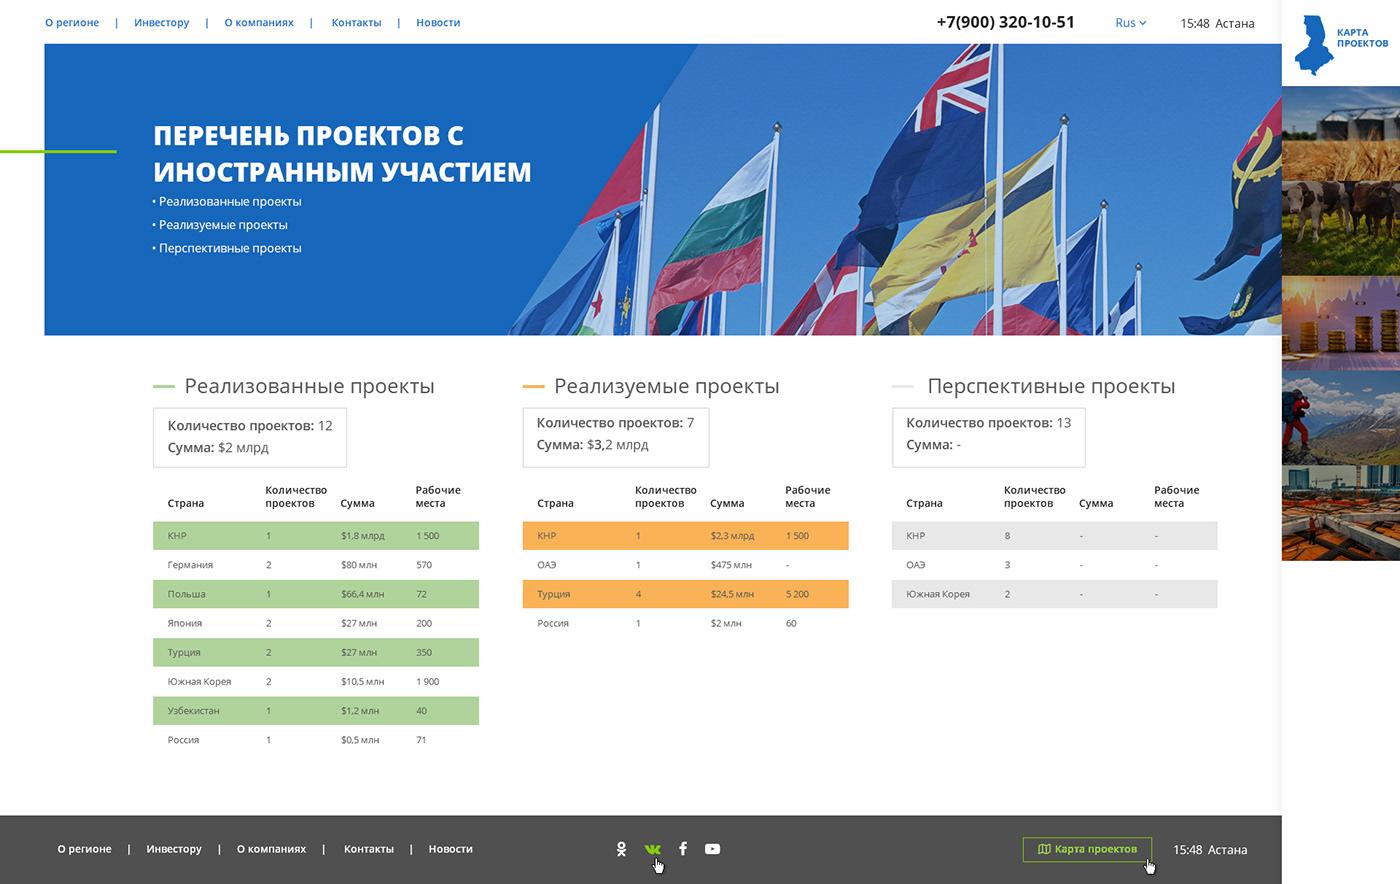 дизайн сайта Инвестиционная компания Turkestan Сайт под ключ инвестиции UI/UX